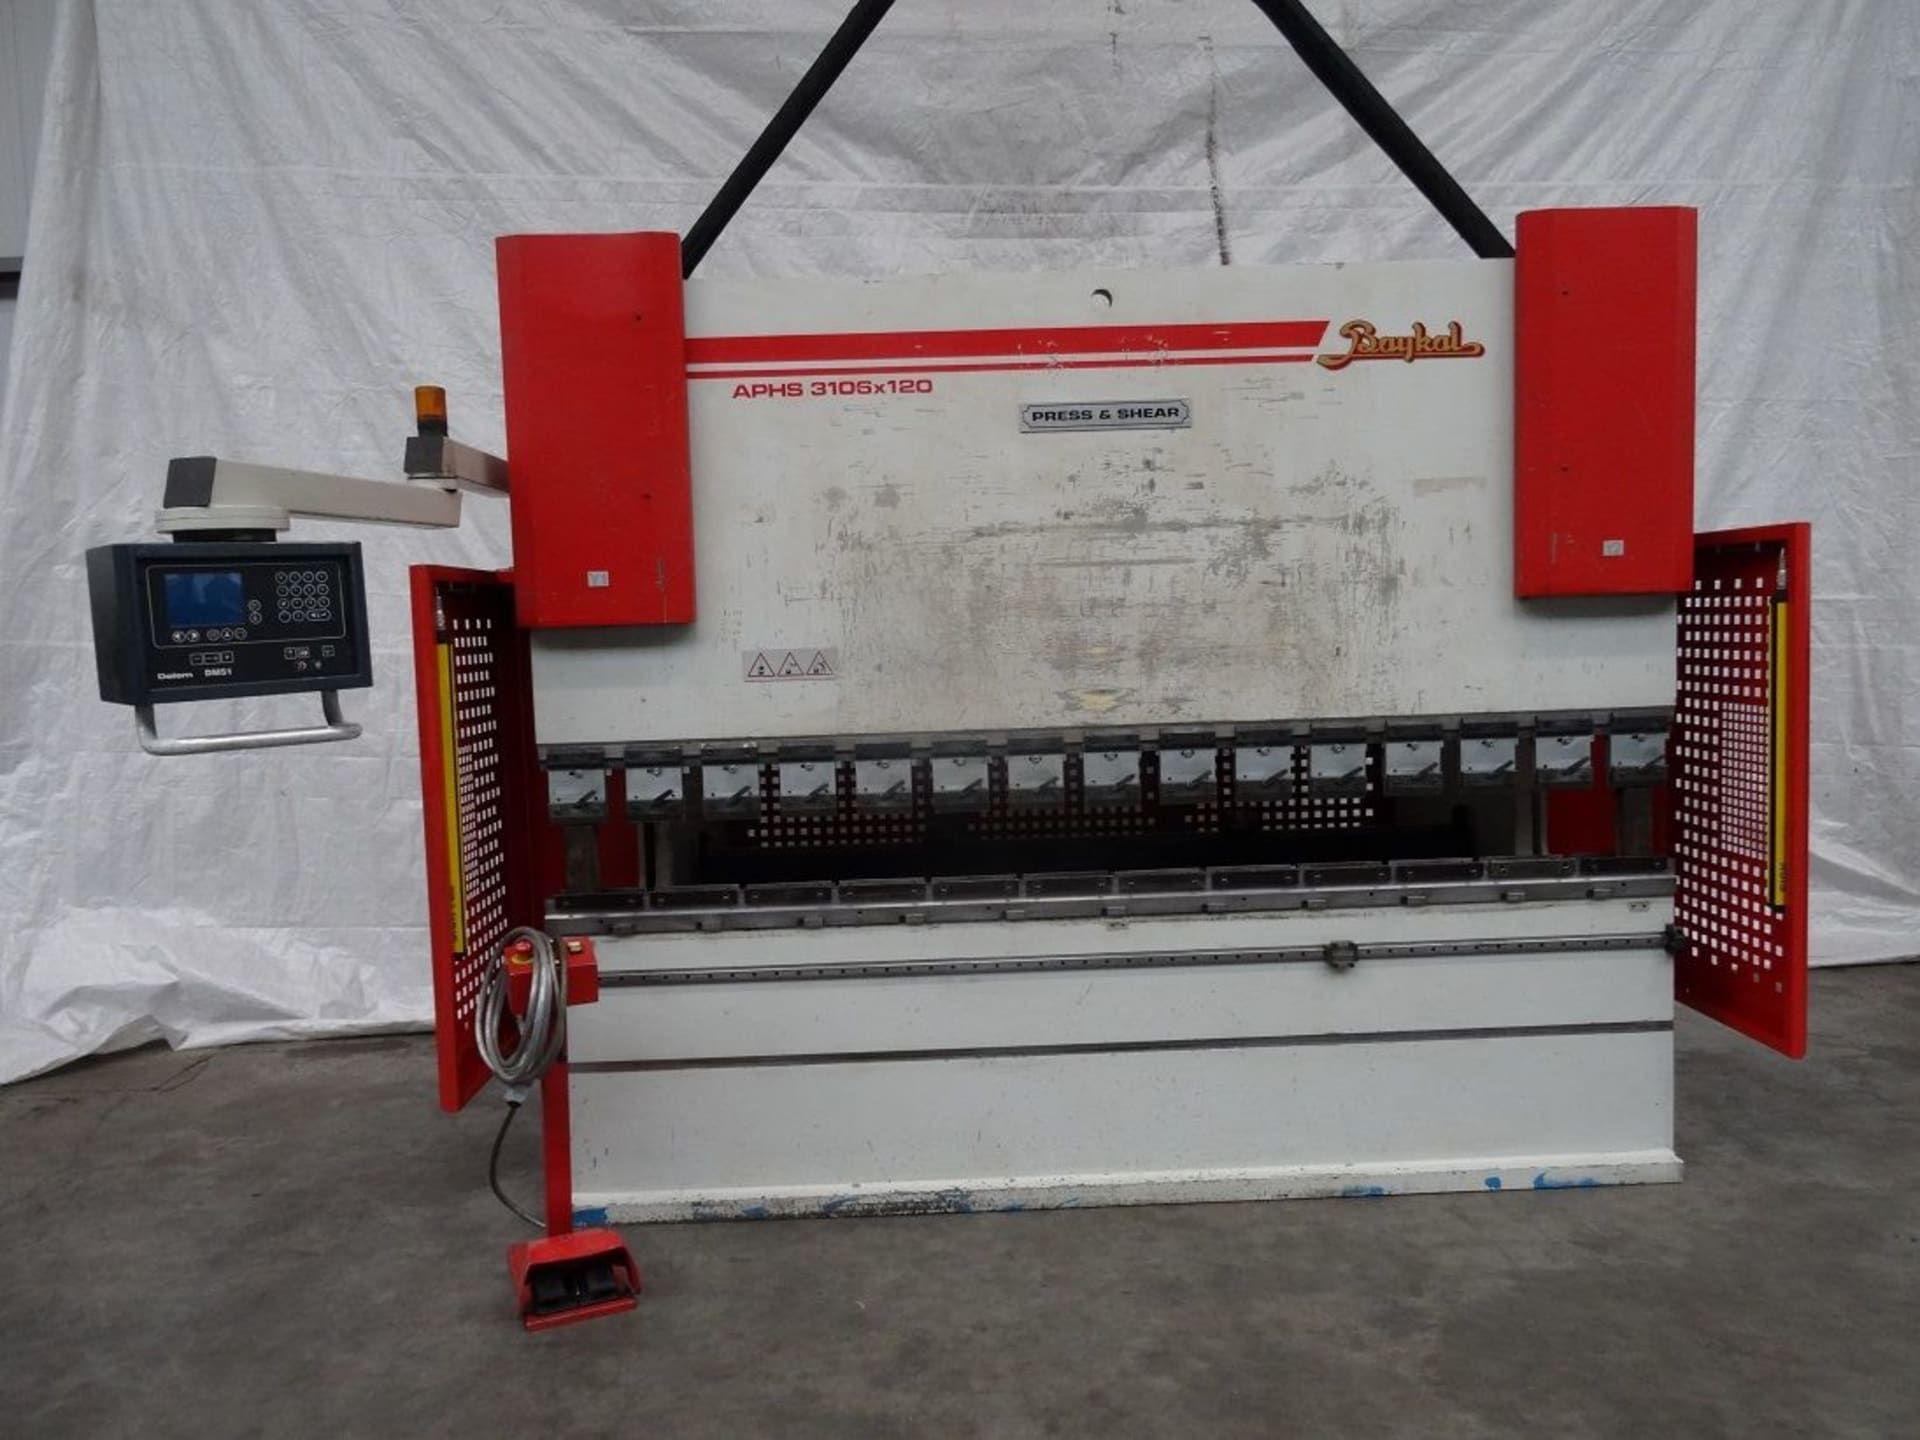 BAYKAL APHS 3106 120 CNC CNC Abkantpresse